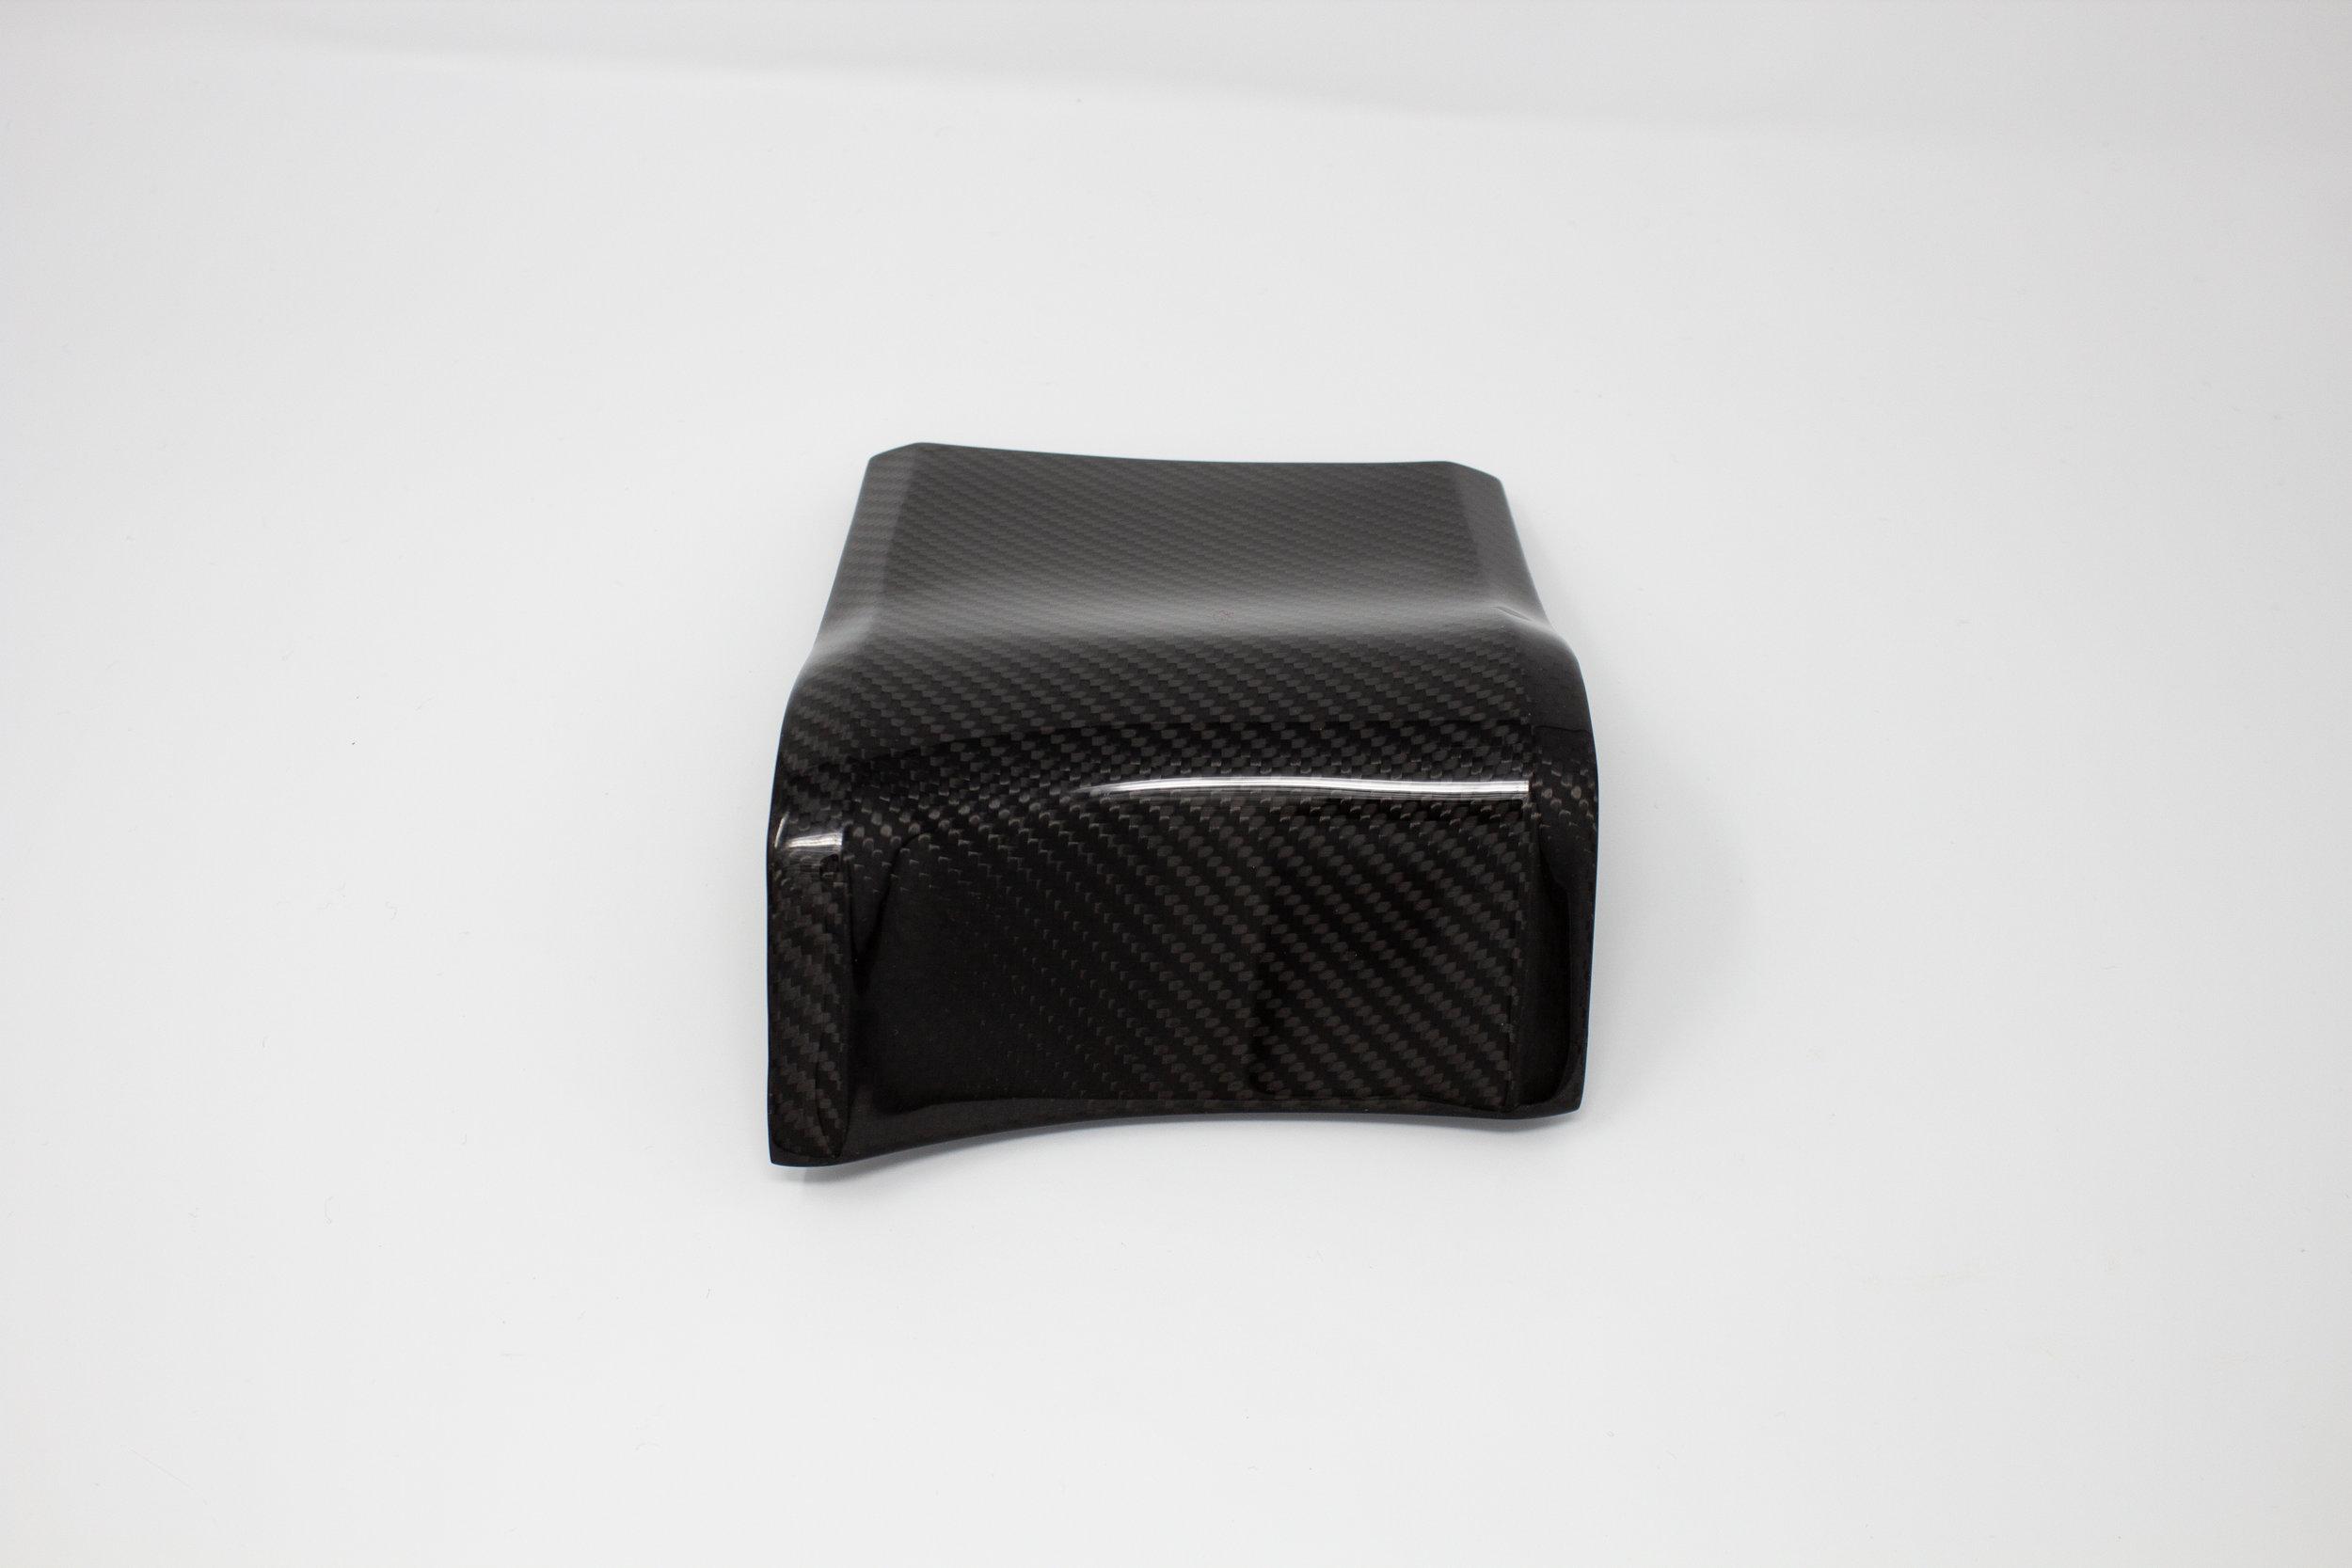 ford-carbon-fiber-door-trim-3.jpg